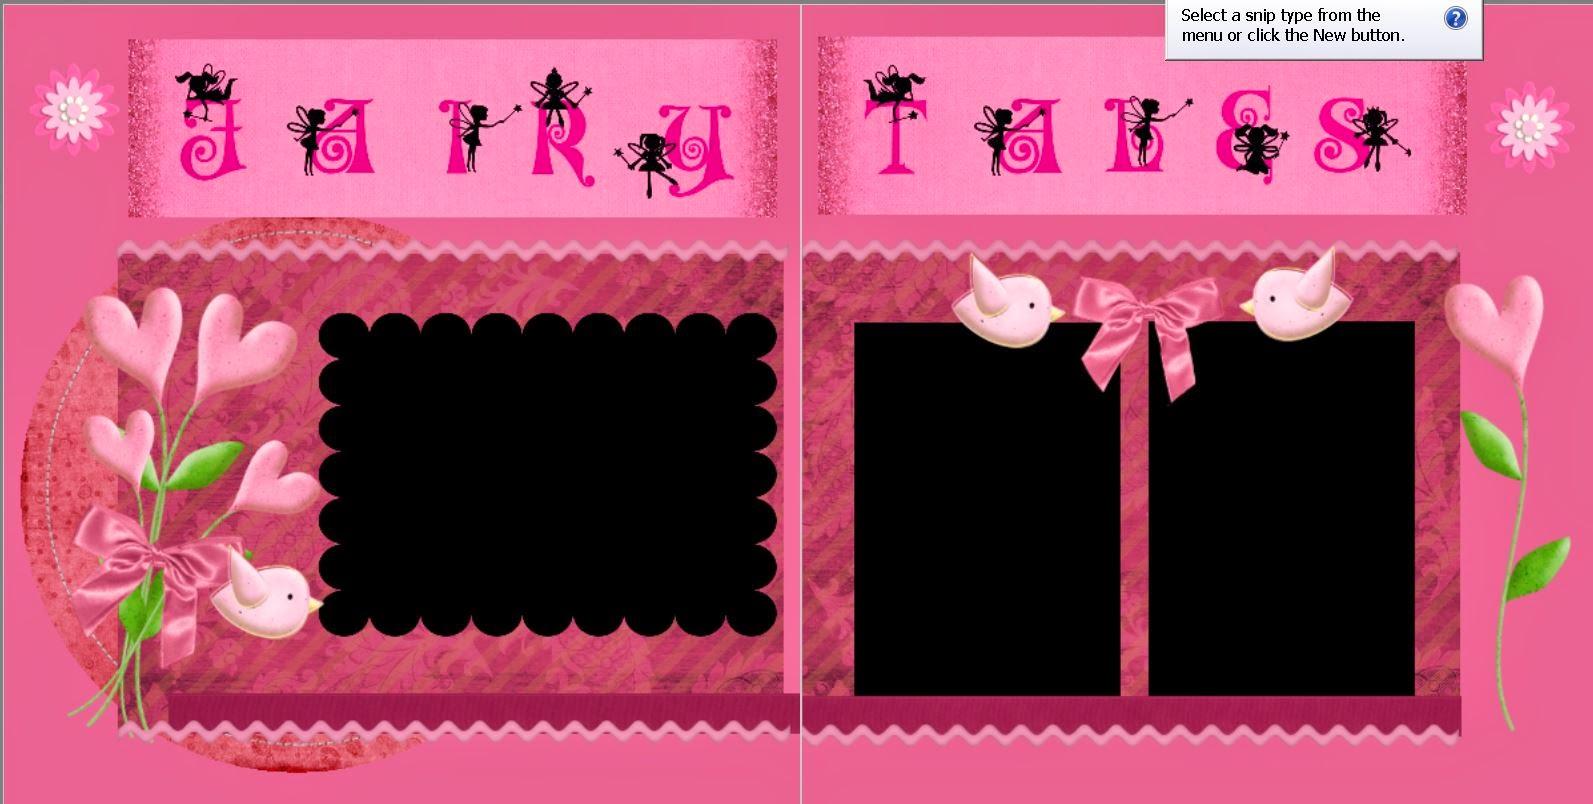 http://4.bp.blogspot.com/-LXwM636bsyo/U4kHcJFGuVI/AAAAAAAADnc/br5-6mnuOF0/s1600/fairy+cut+my+memories+demo+2.JPG